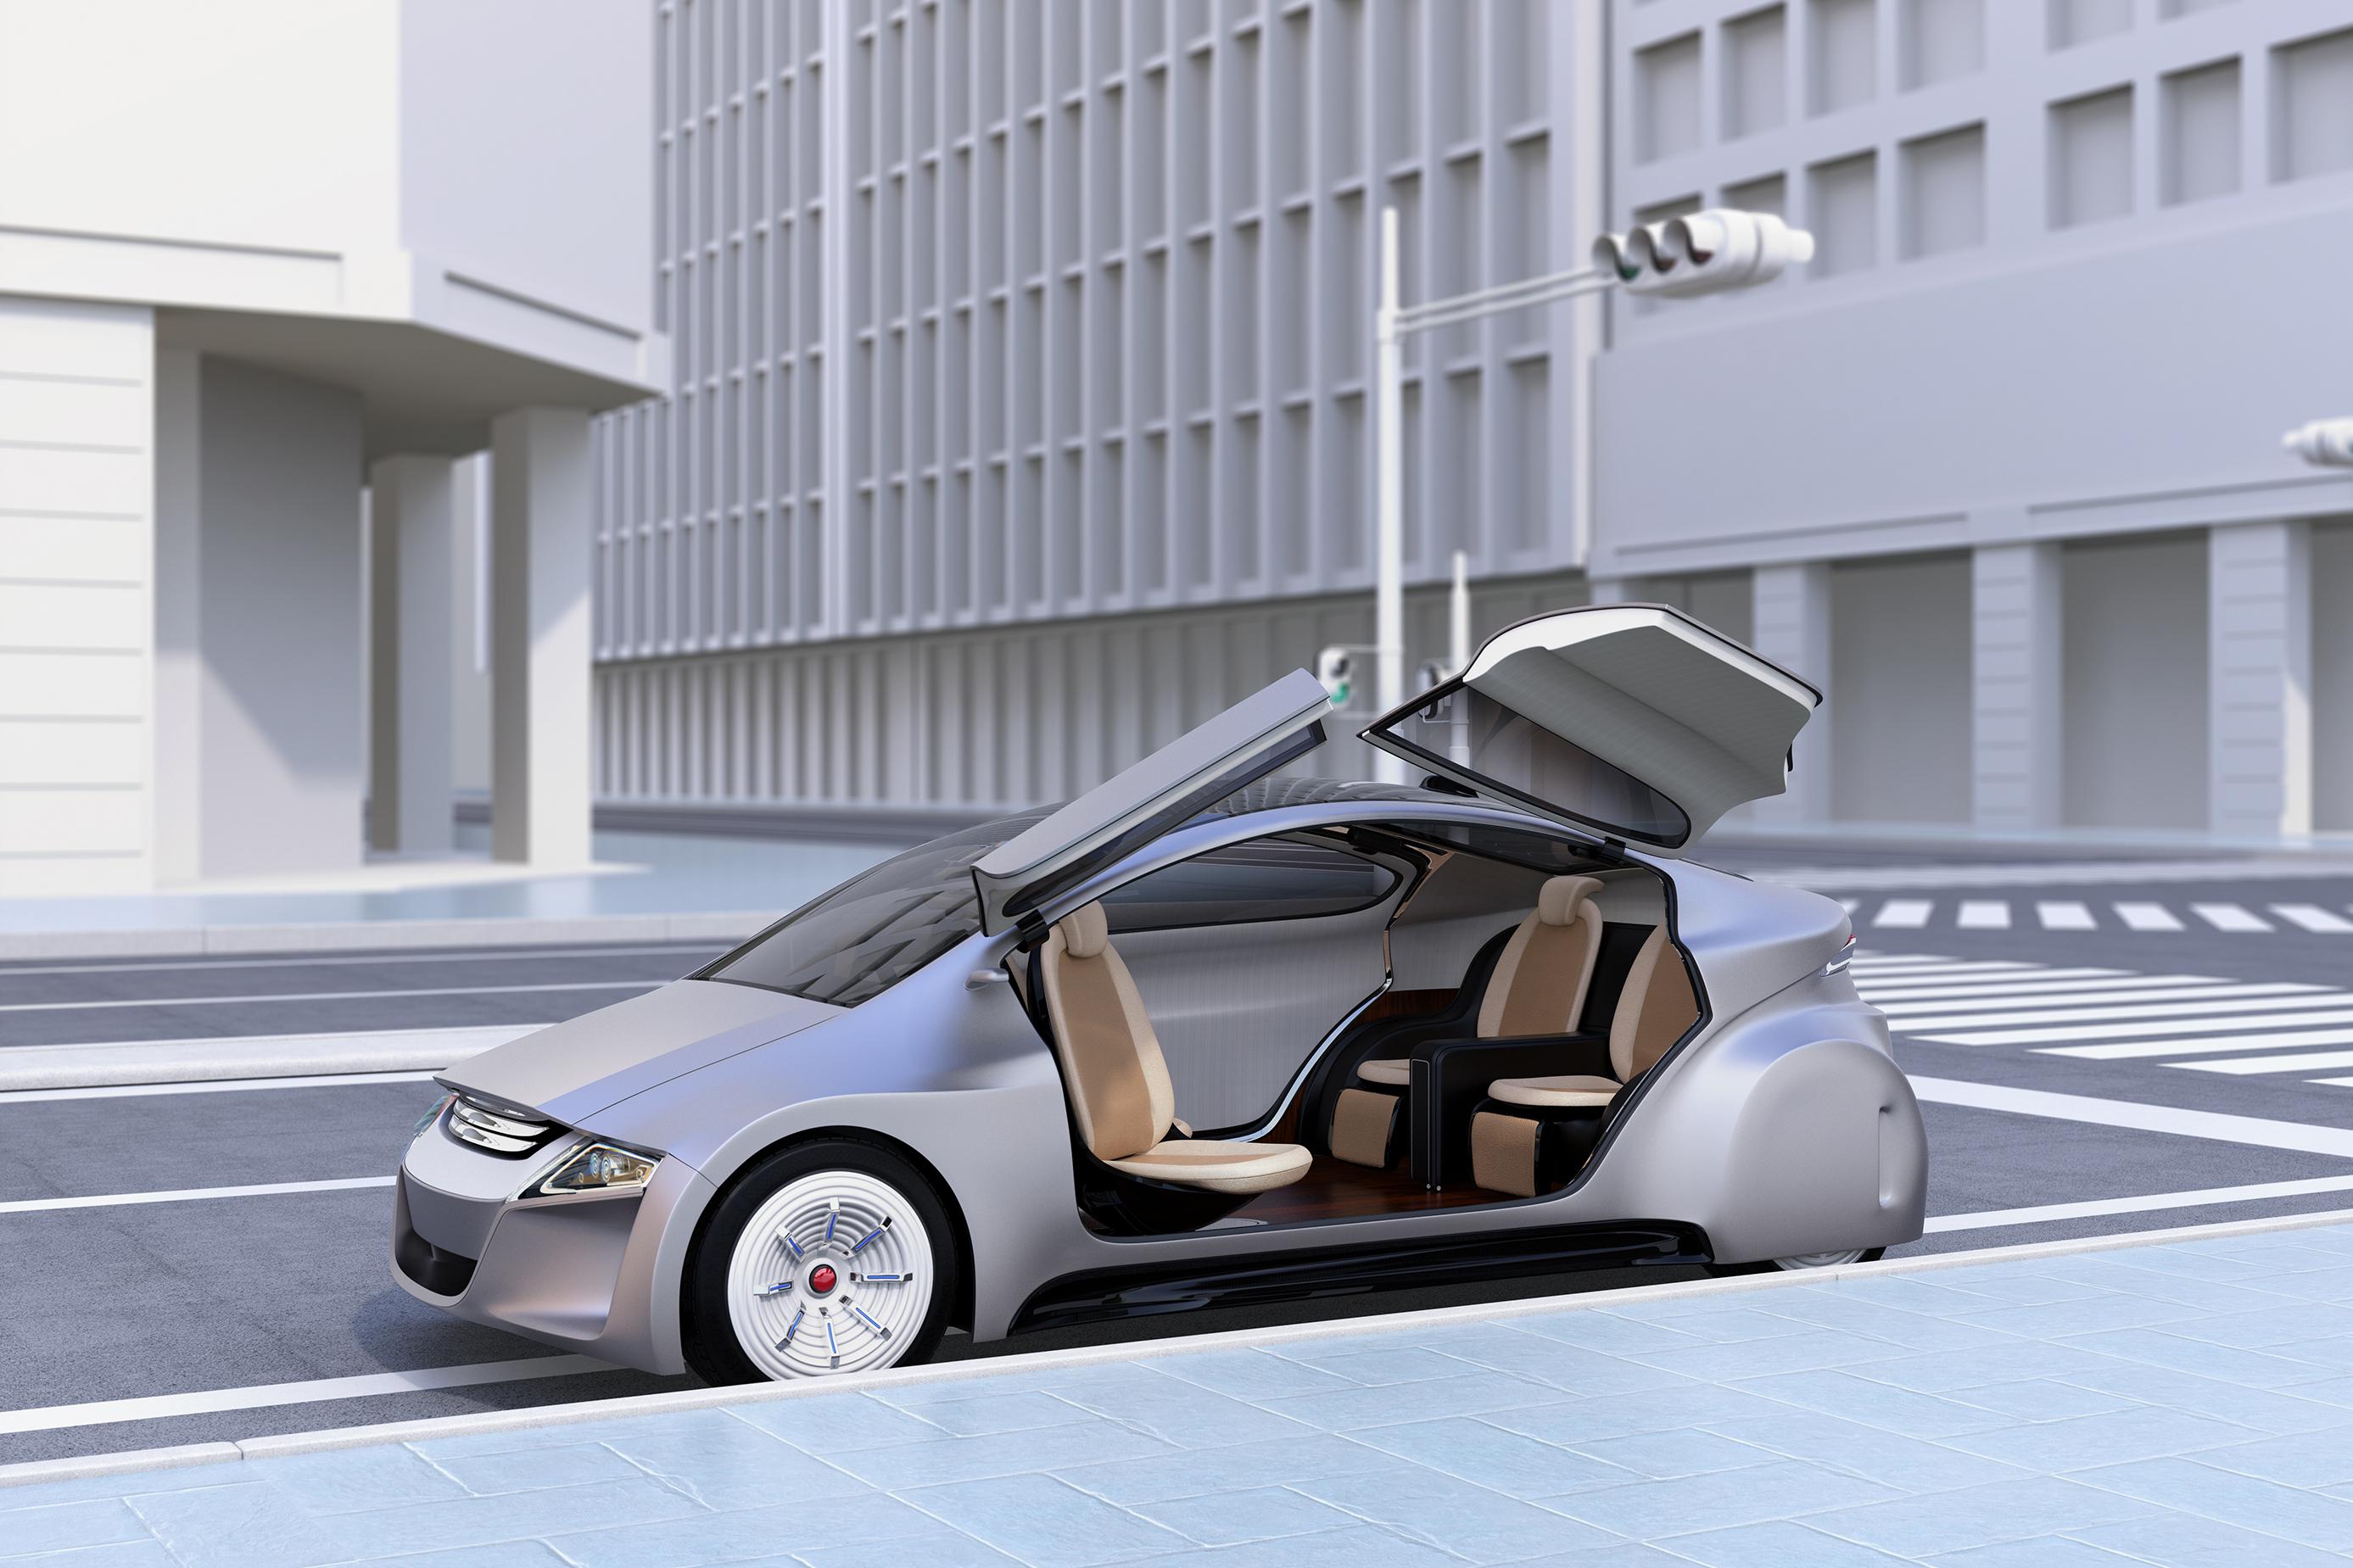 180724-future-work-perks-self-driving-cars